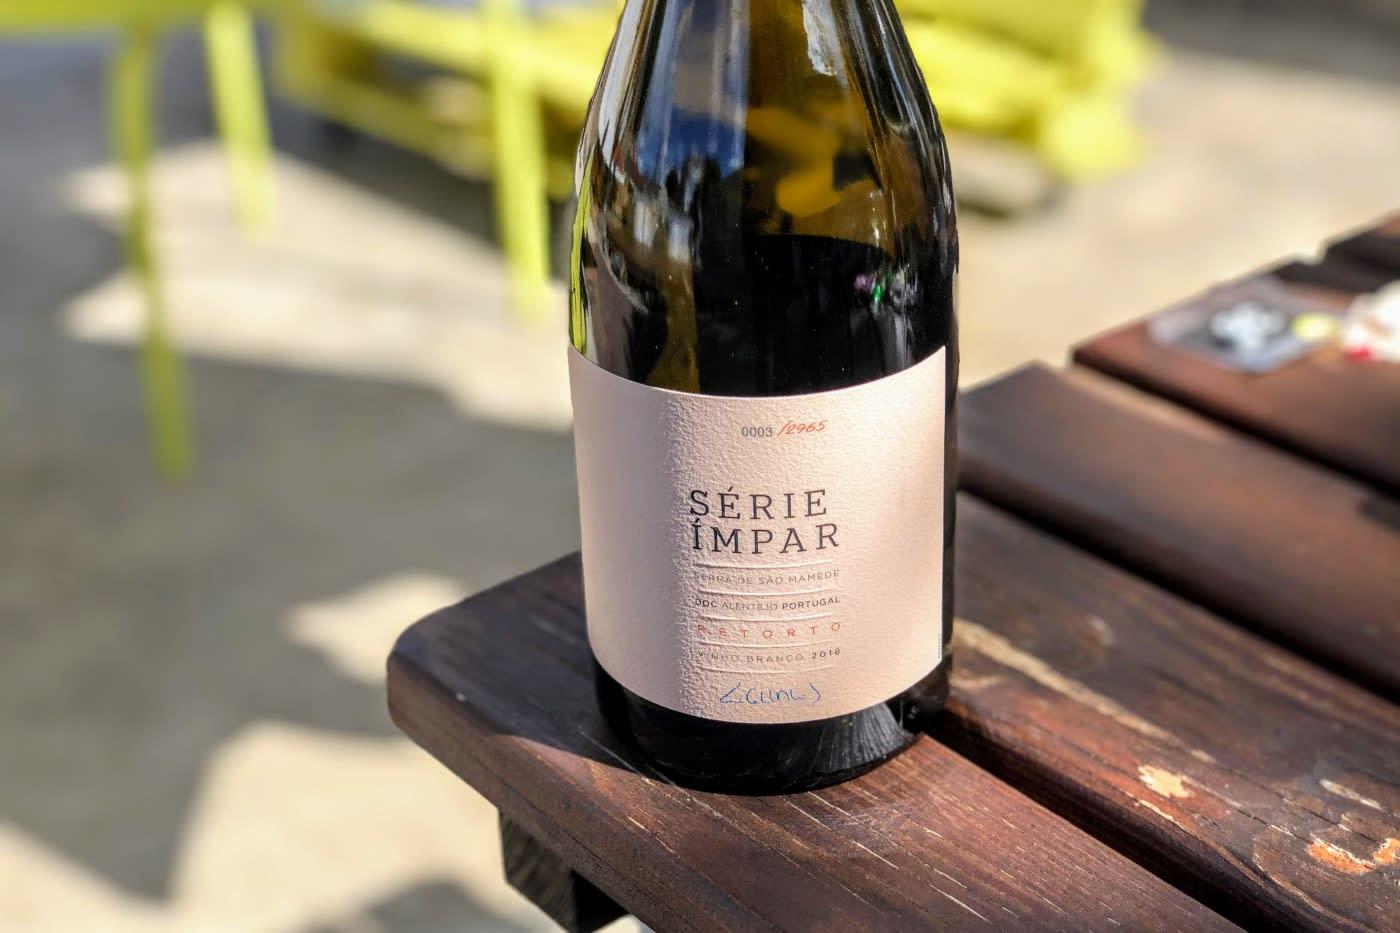 serie-impar retorto vinho branco vinhas velhas portalegre